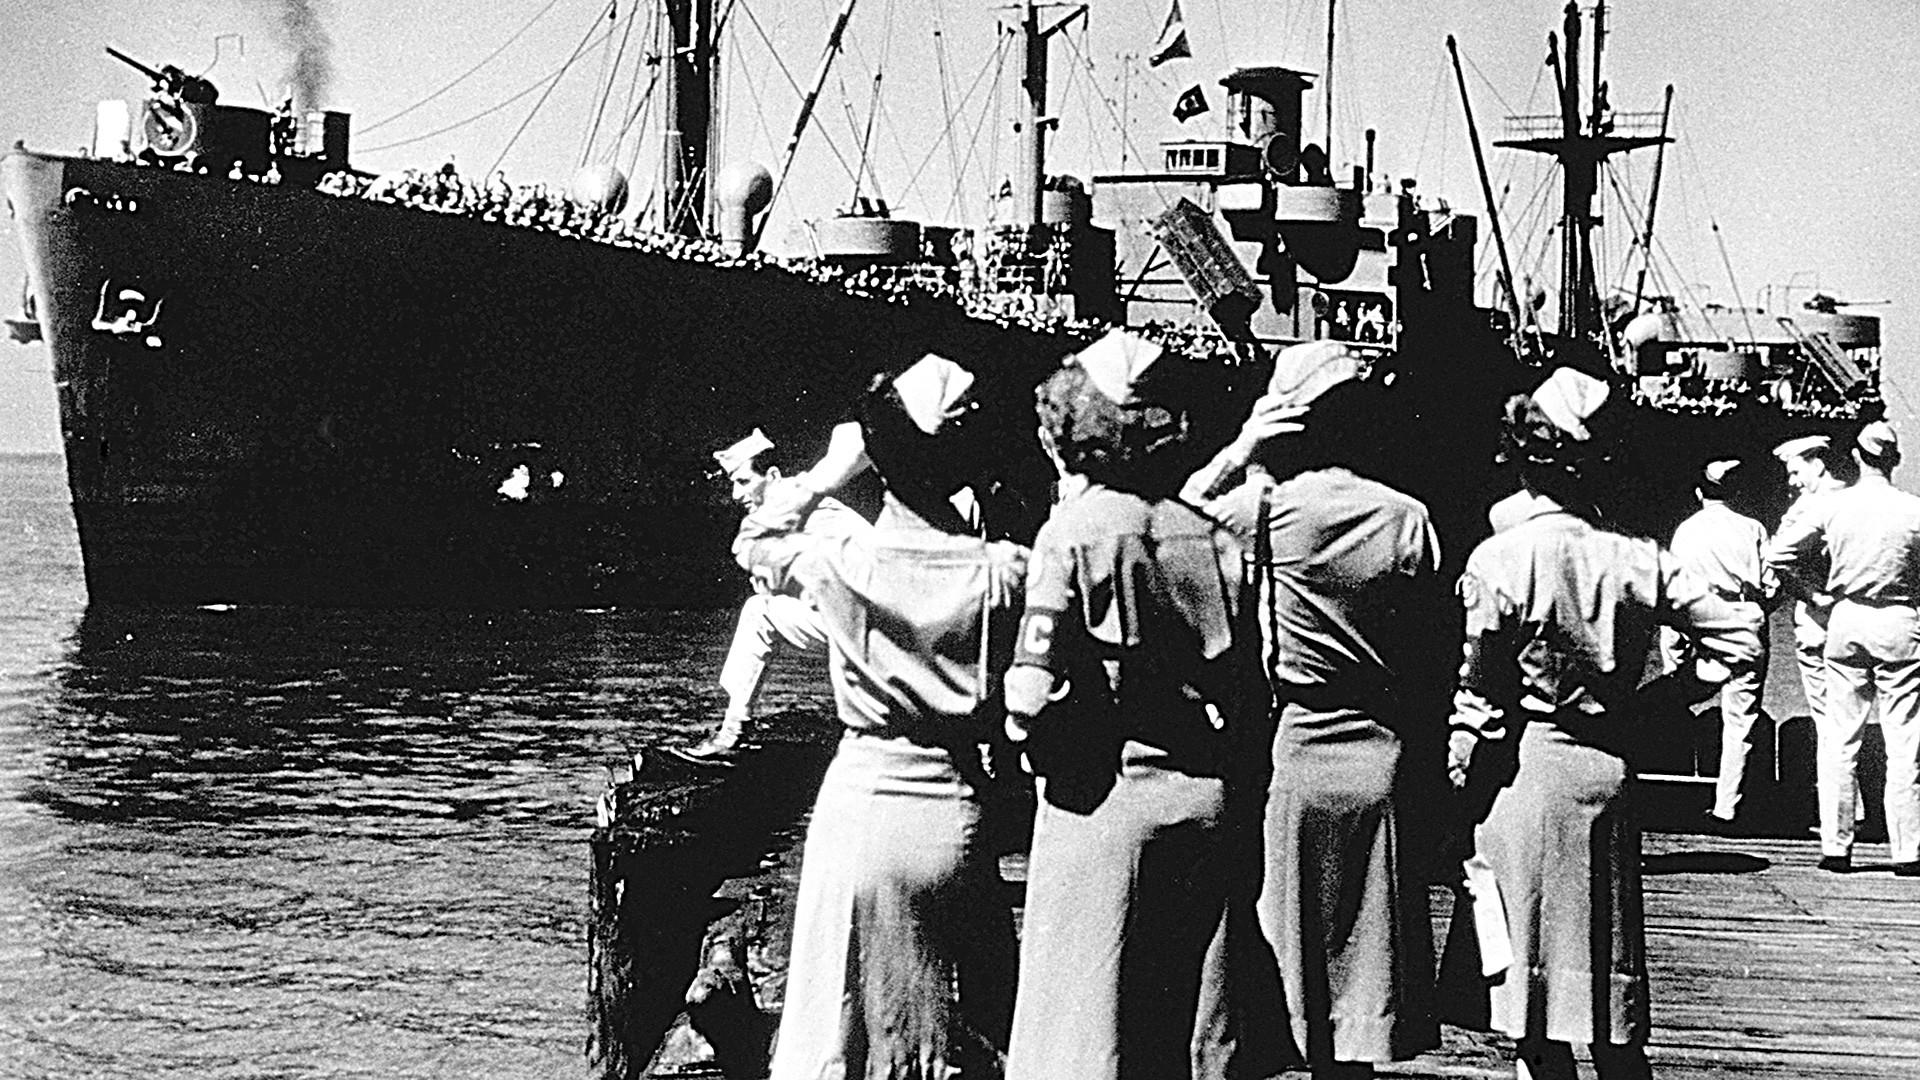 Die SS Cornelius Harnett im Hafen Newport News, Virginia, Juni 1945